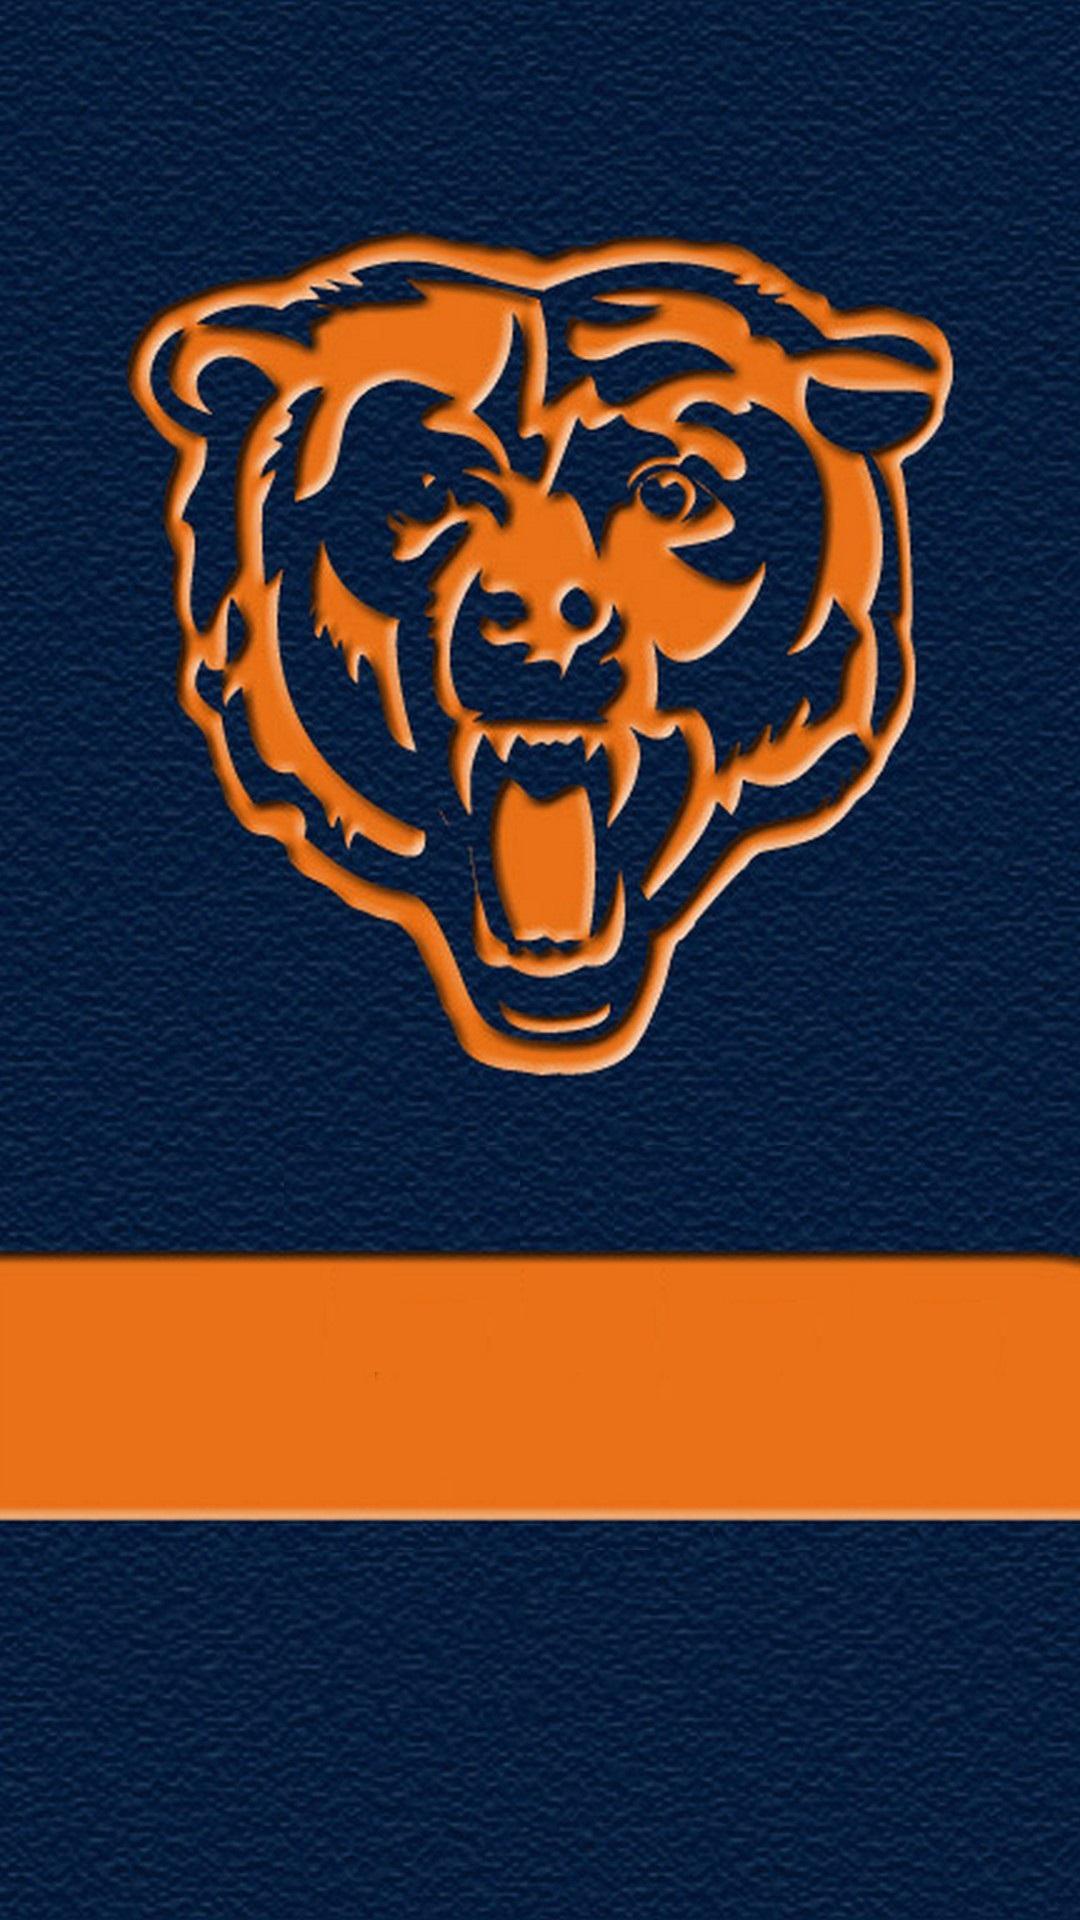 Chicago Bears Iphone 7 Wallpaper With High-resolution - Delran High School Logo - HD Wallpaper